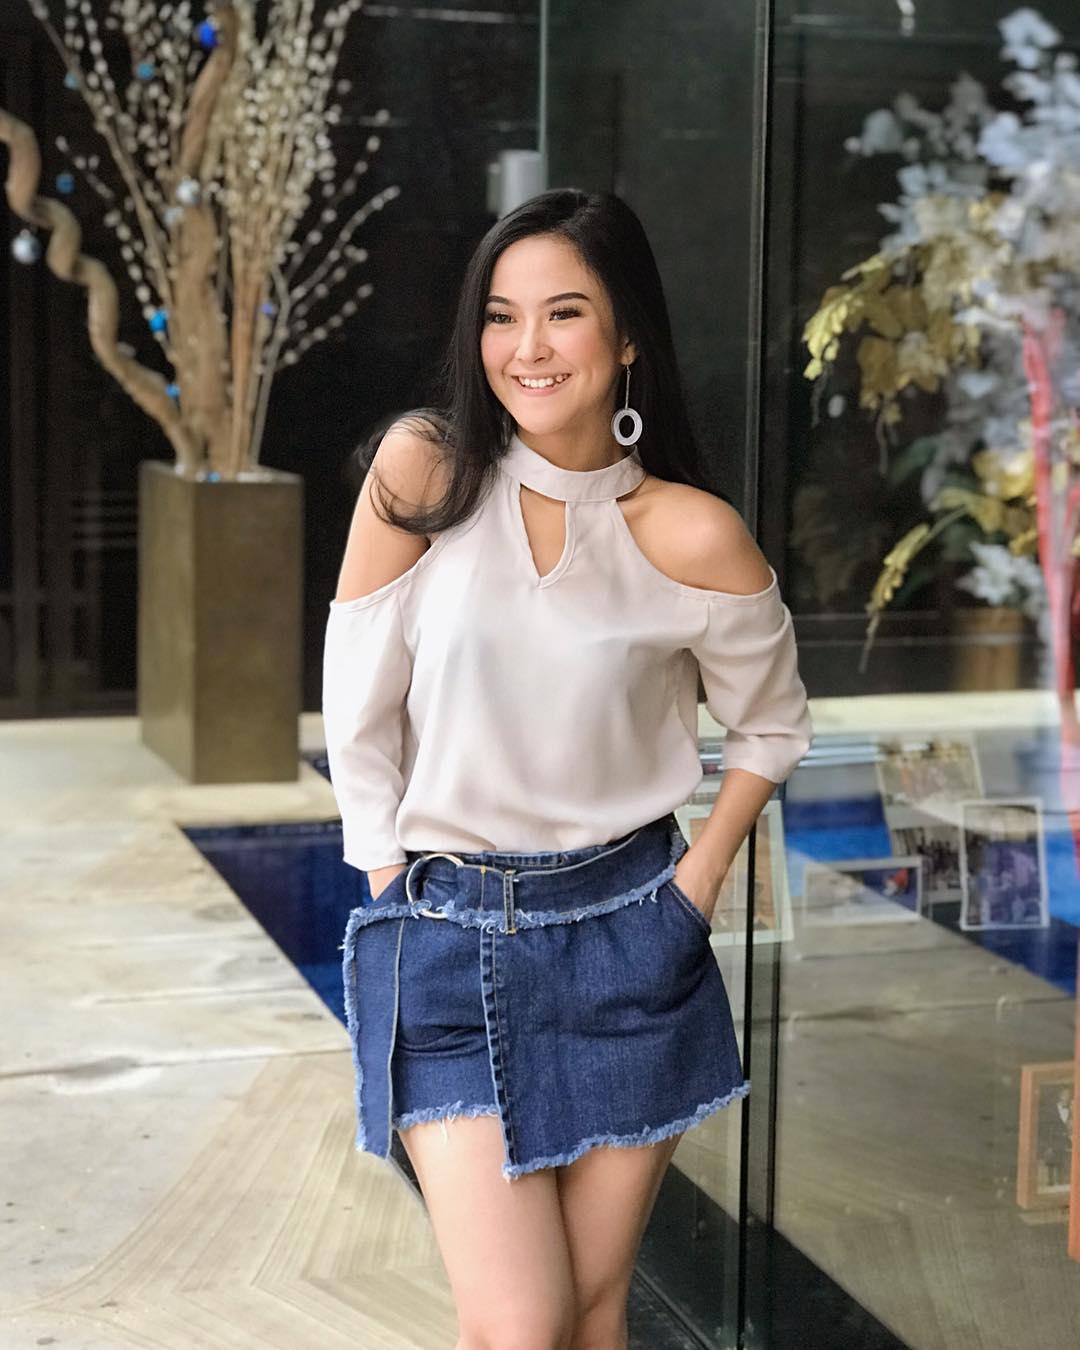 Gabriella Larasati, Artis Indonesia yang Cantik dan Multitalenta